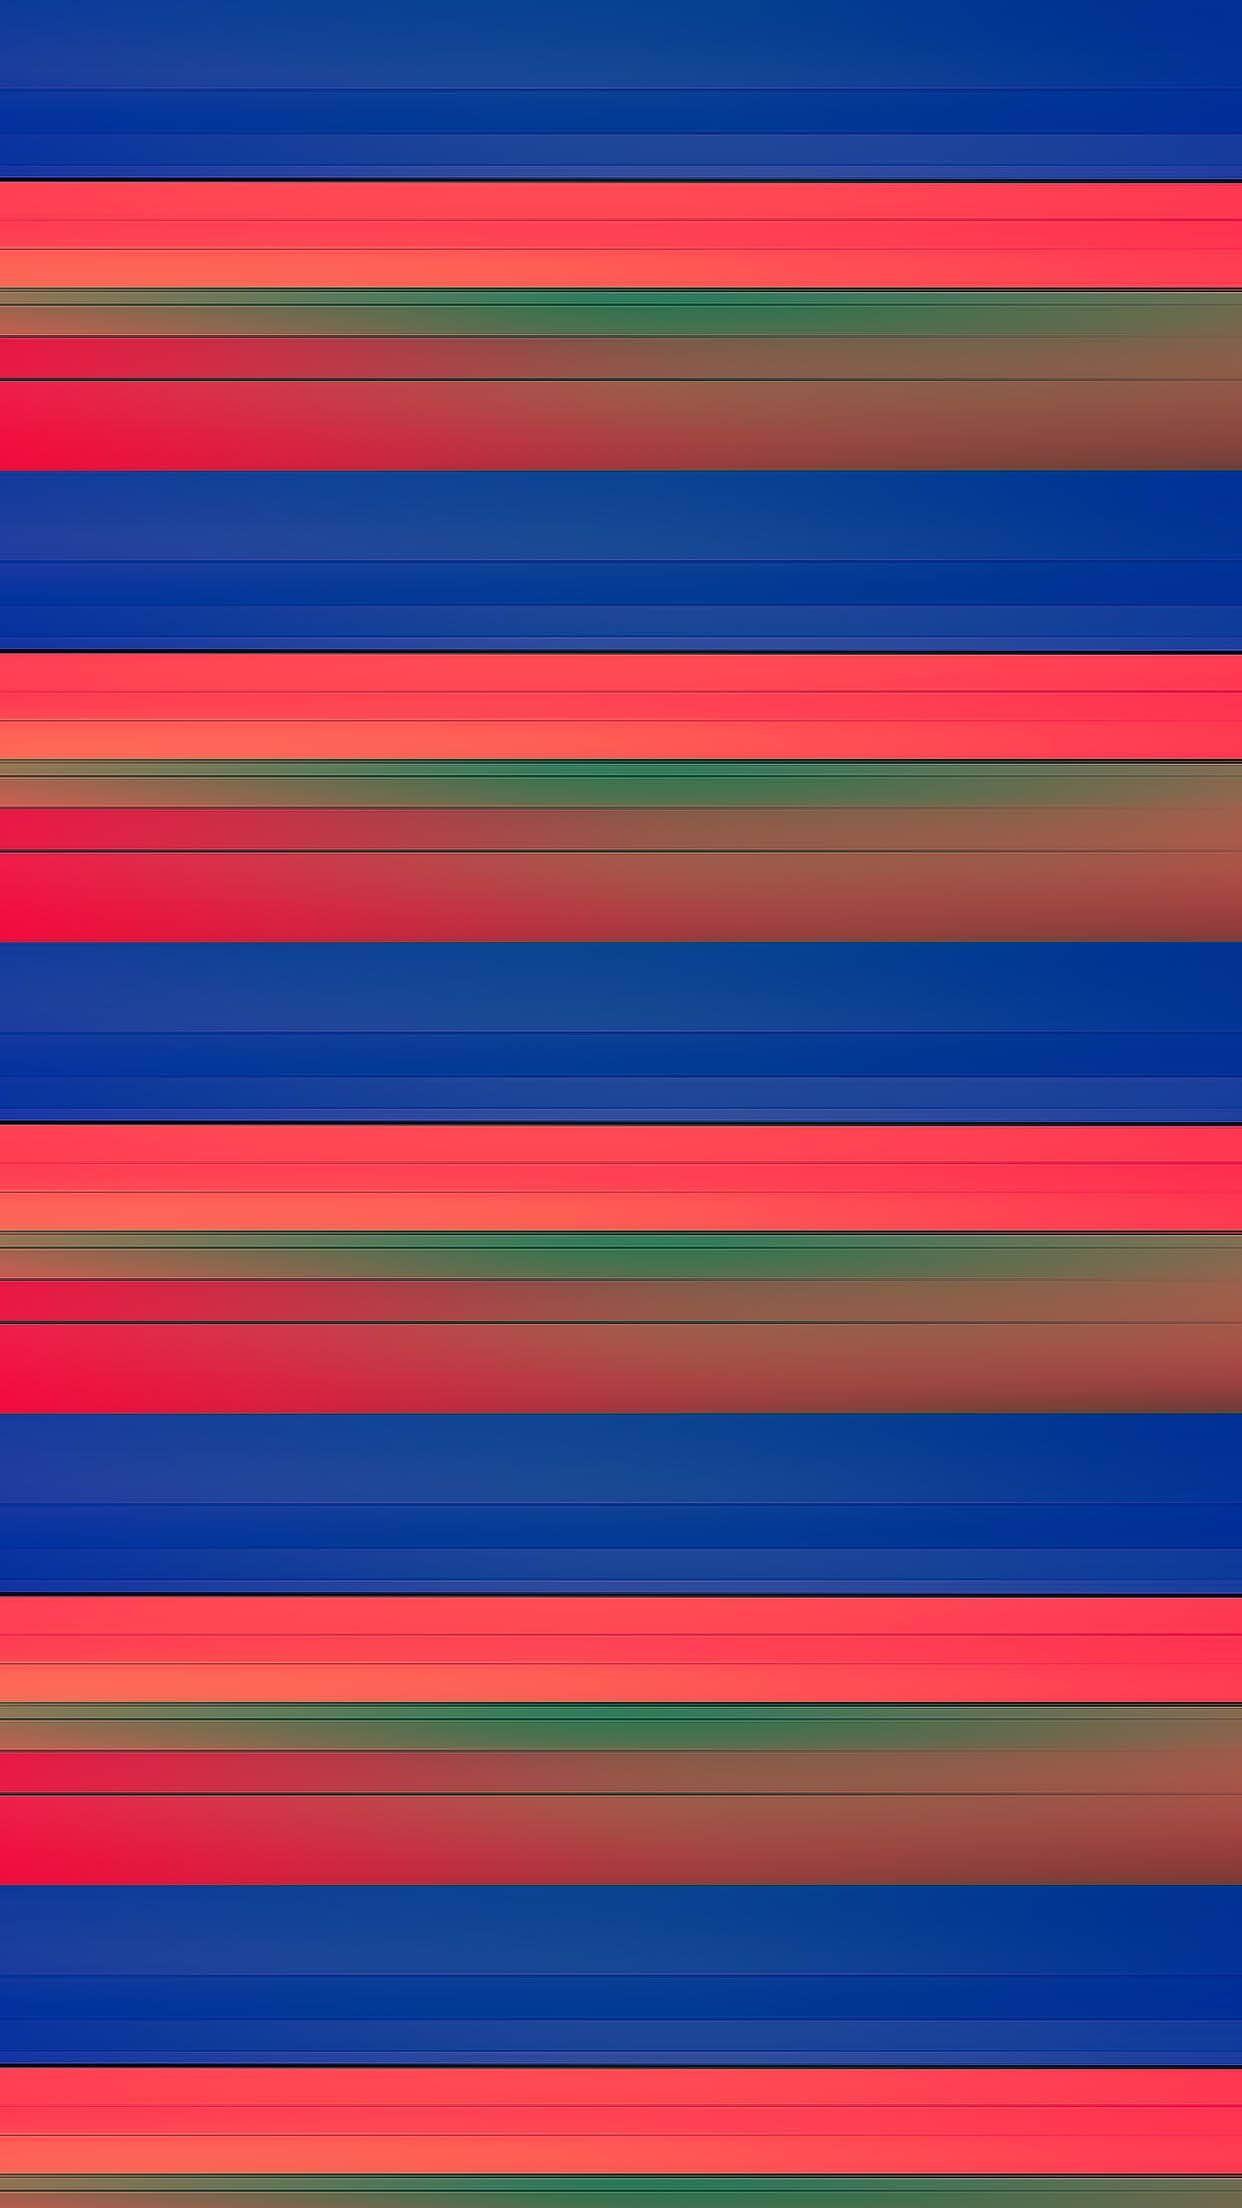 خلفيات ايفون Iphone Lockscreen Wallpaper Colourful Wallpaper Iphone Abstract Iphone Wallpaper